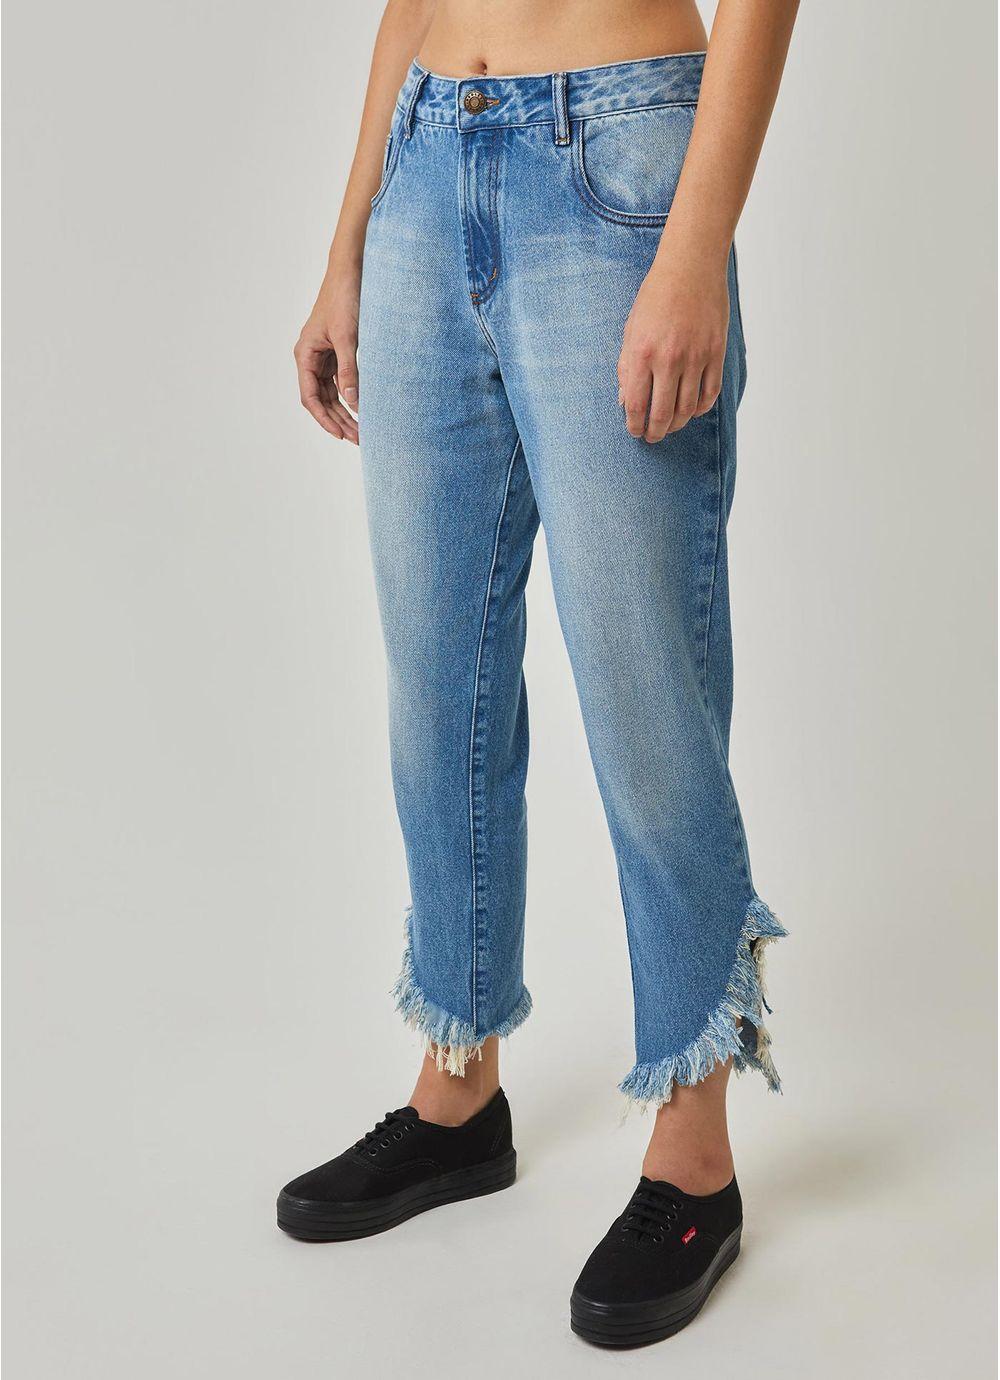 63c0039e5 Calça jeans barra assimétrica JEANS - Compre Online na Redley!